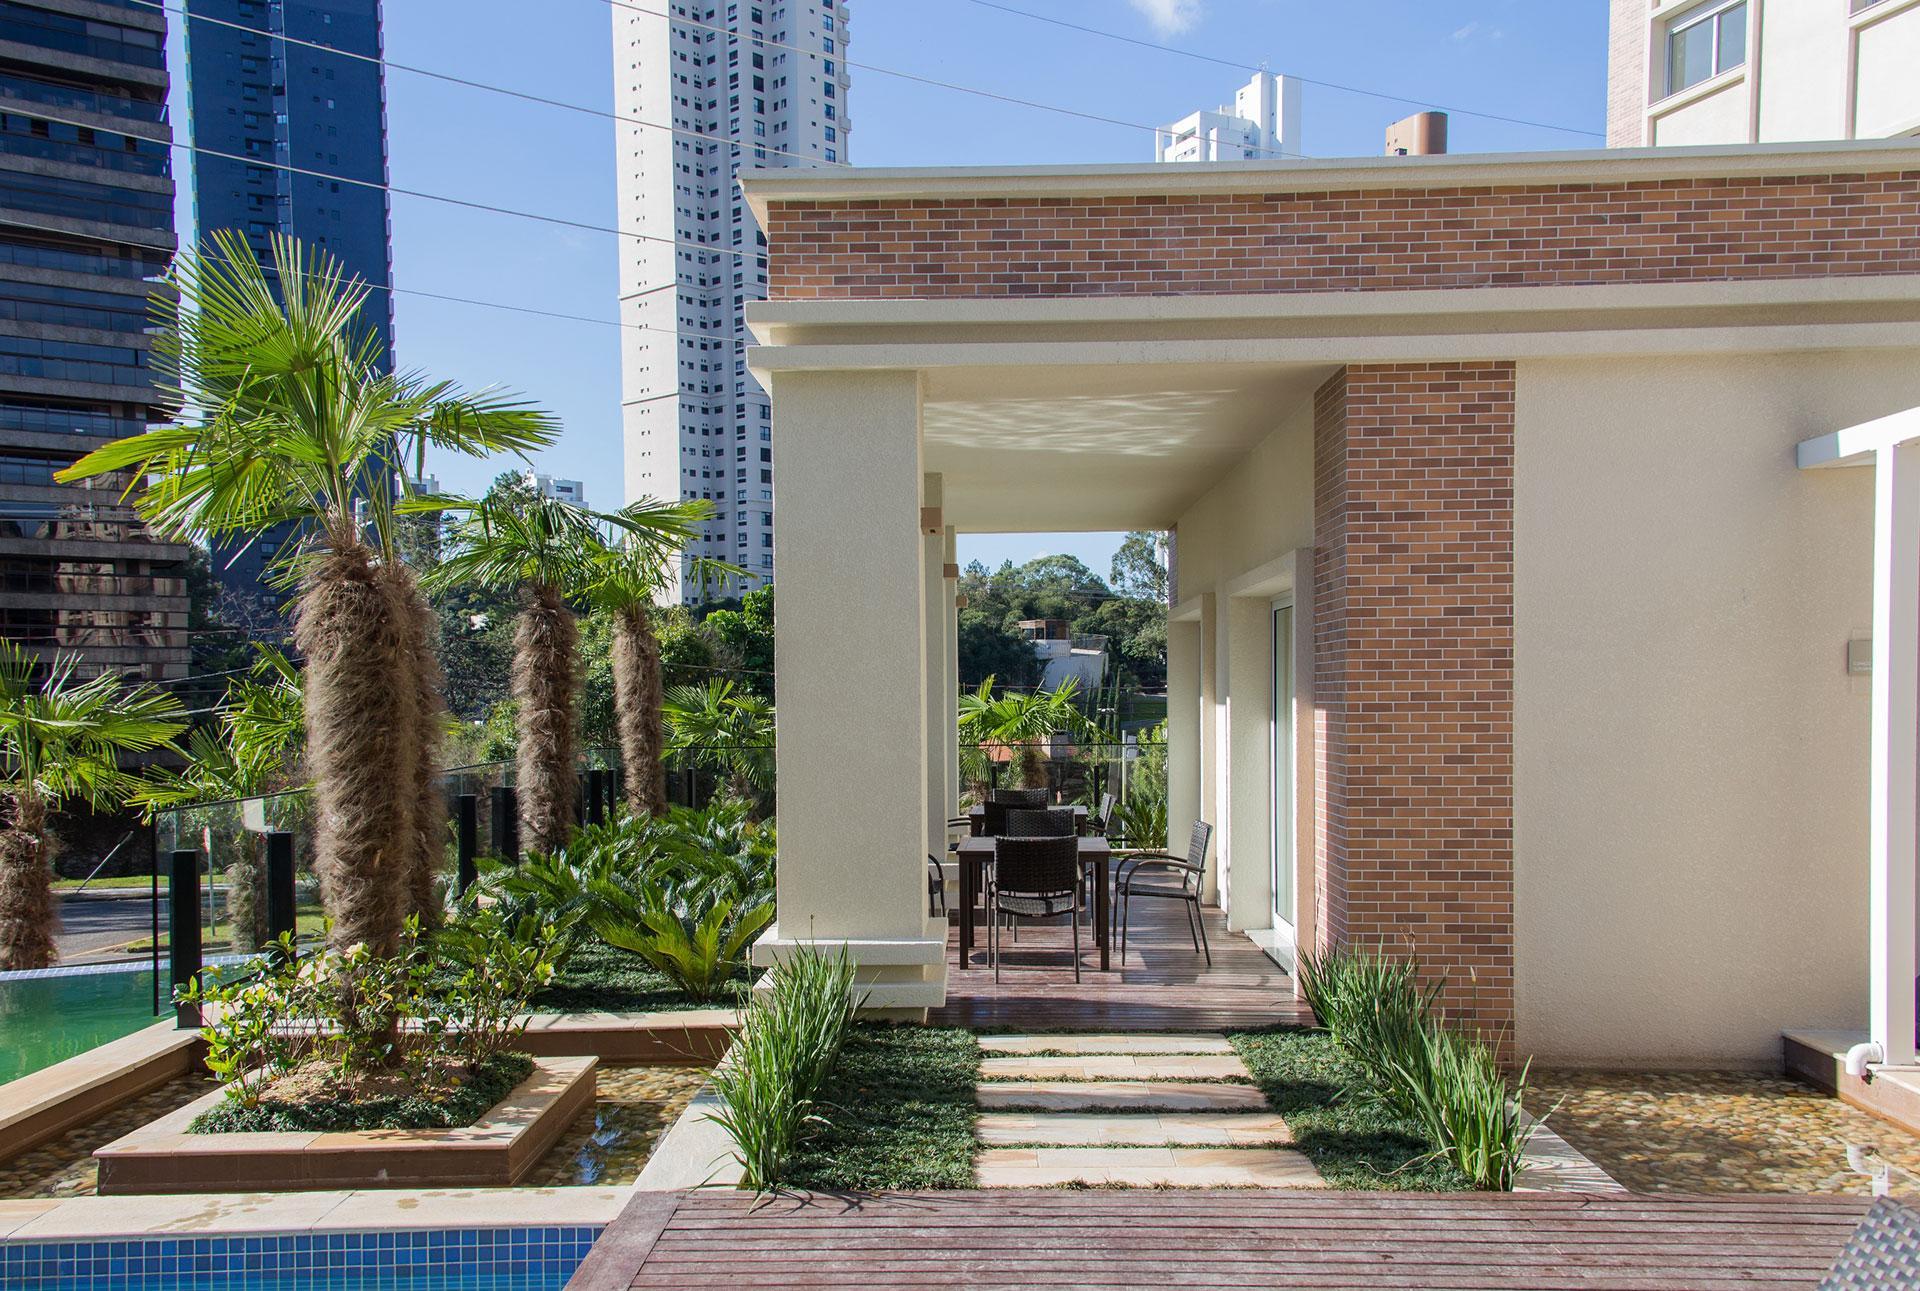 Lazer | Reserva Juglair Ecoville – Apartamentono  Ecoville - Curitiba - Paraná